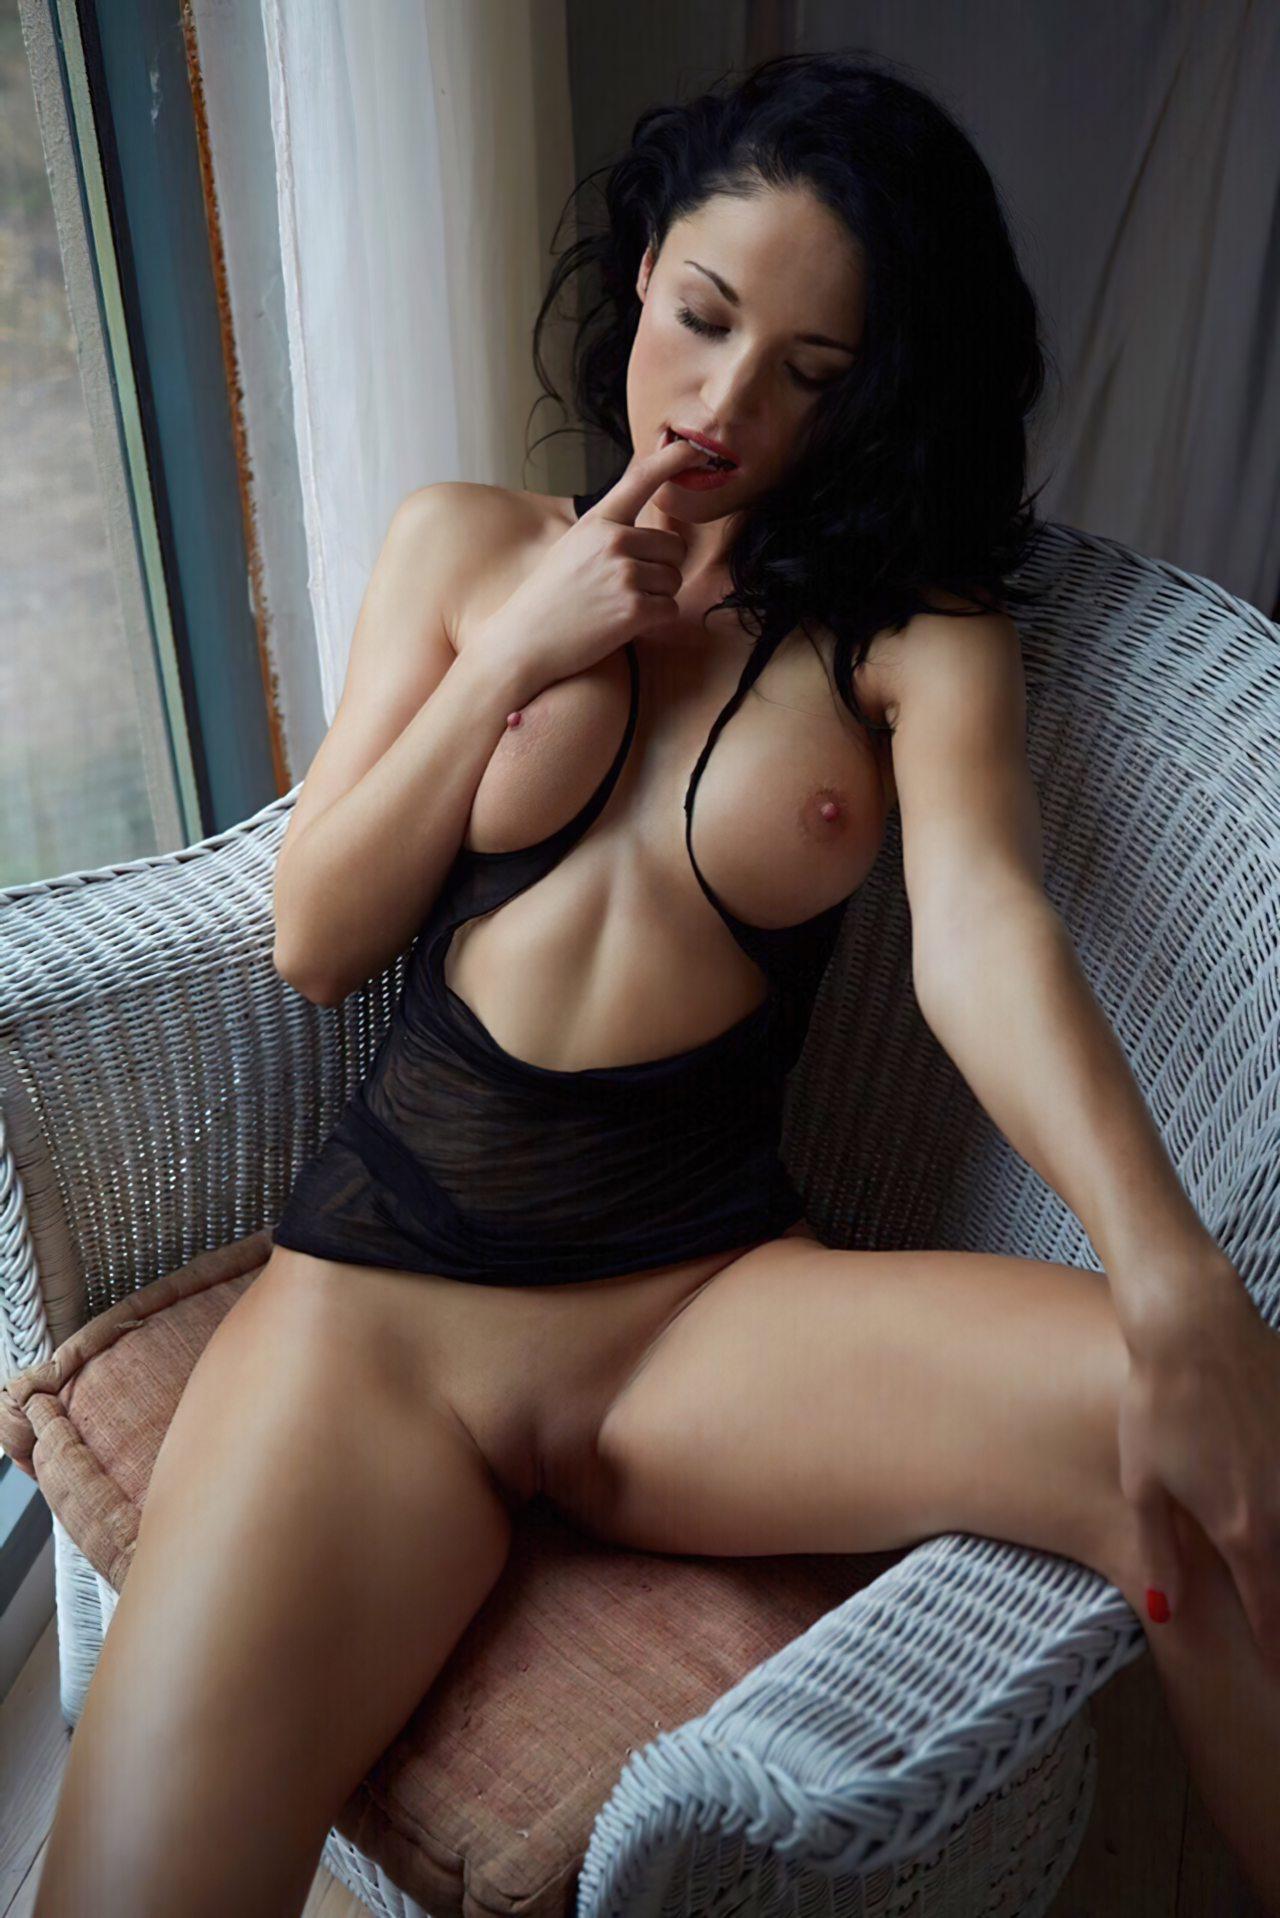 Mulheres Despidas (38)